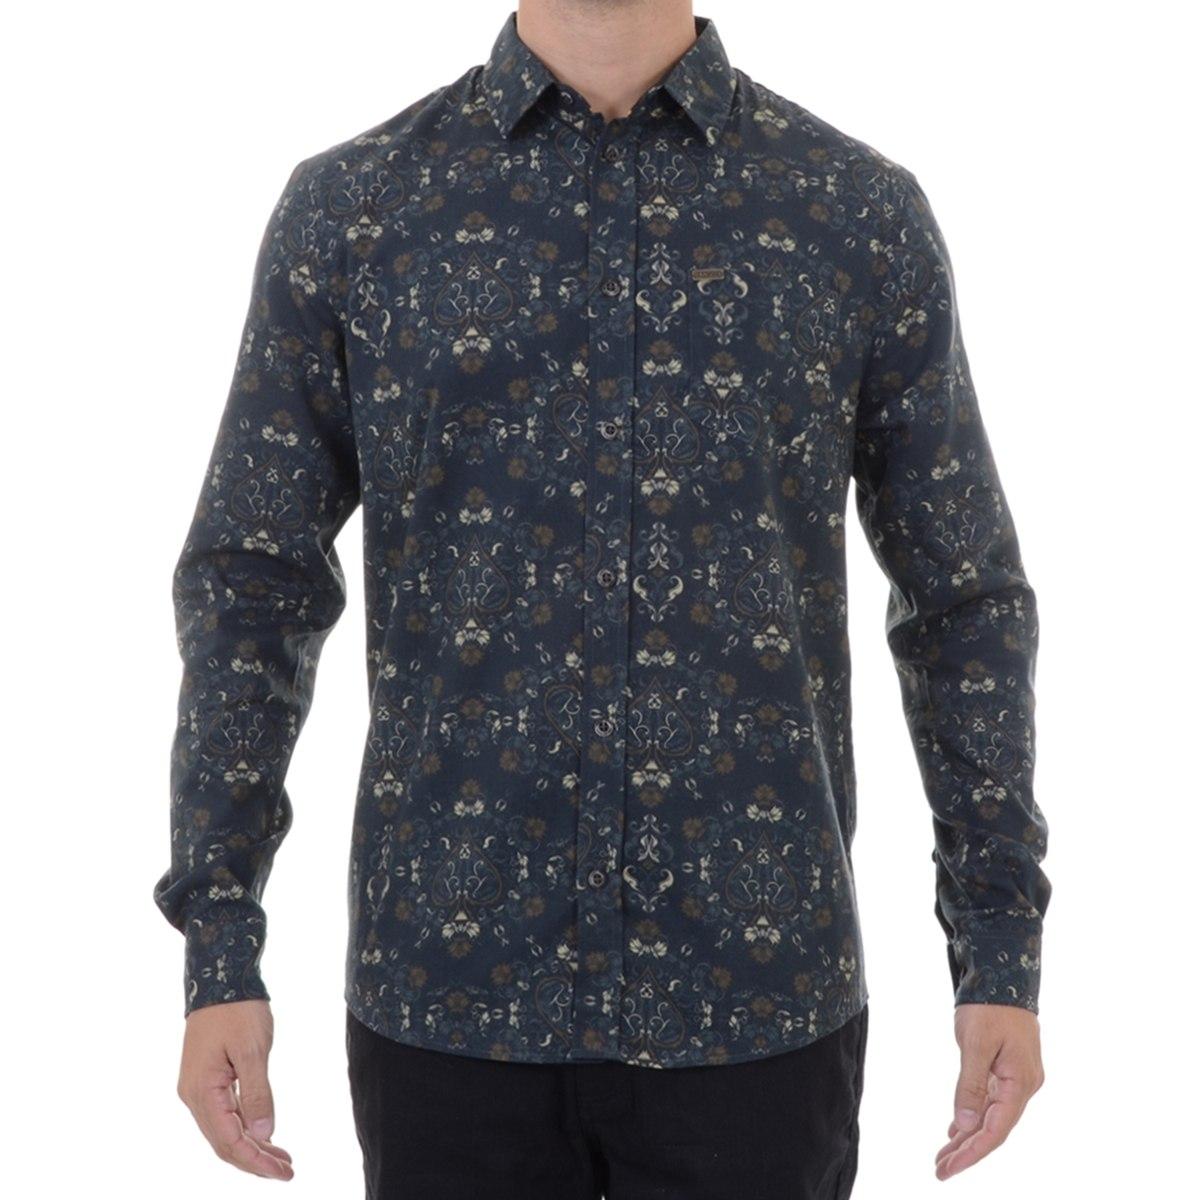 camisa masculina mcd vintage flow. Carregando zoom. ad871337175